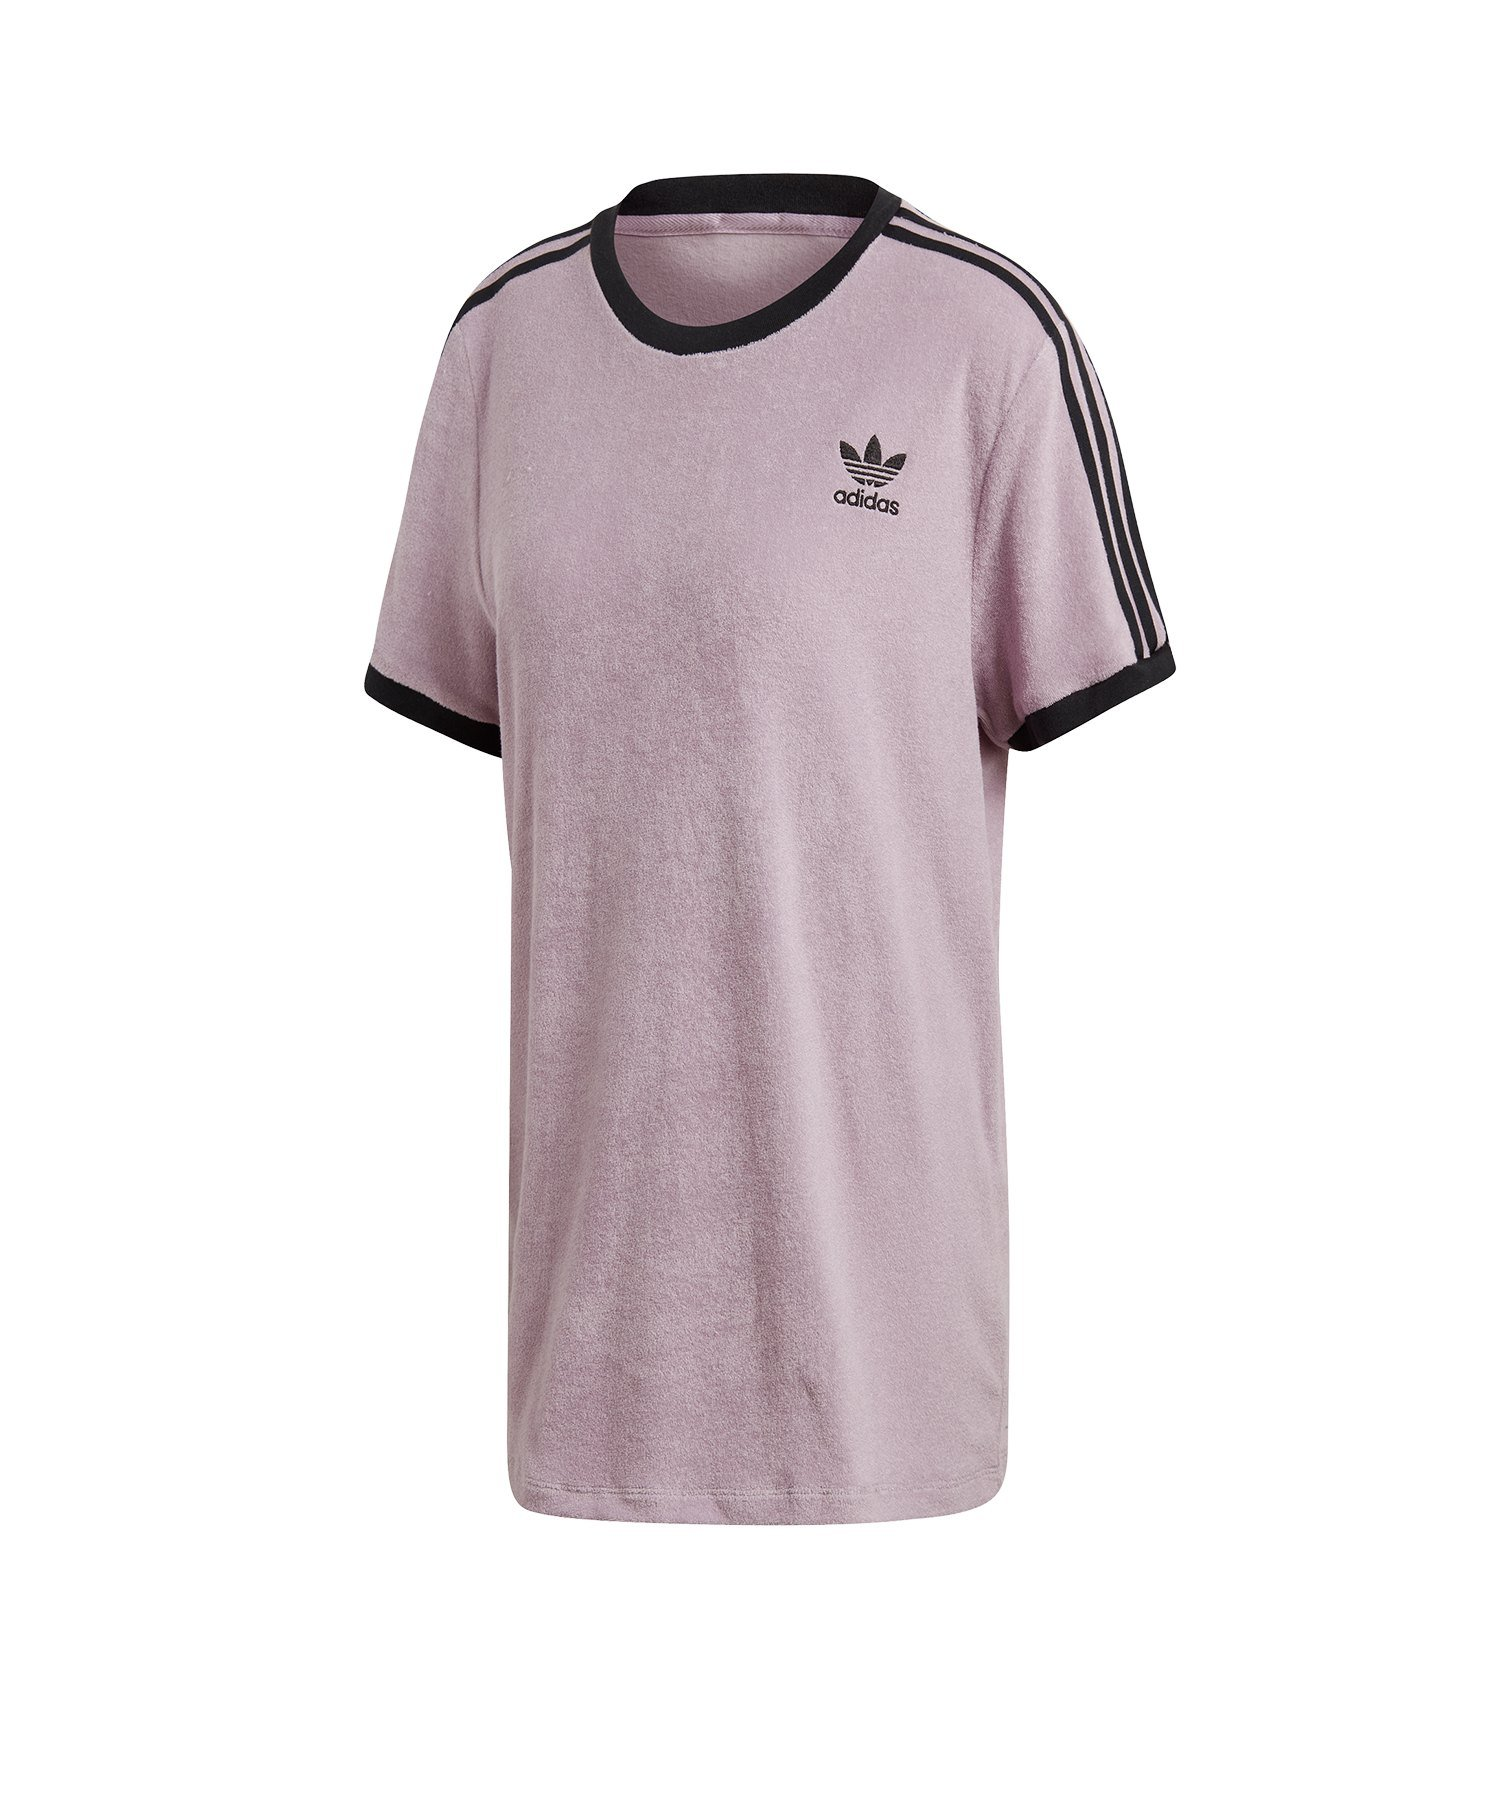 adidas originals 3 stripes t shirt damen